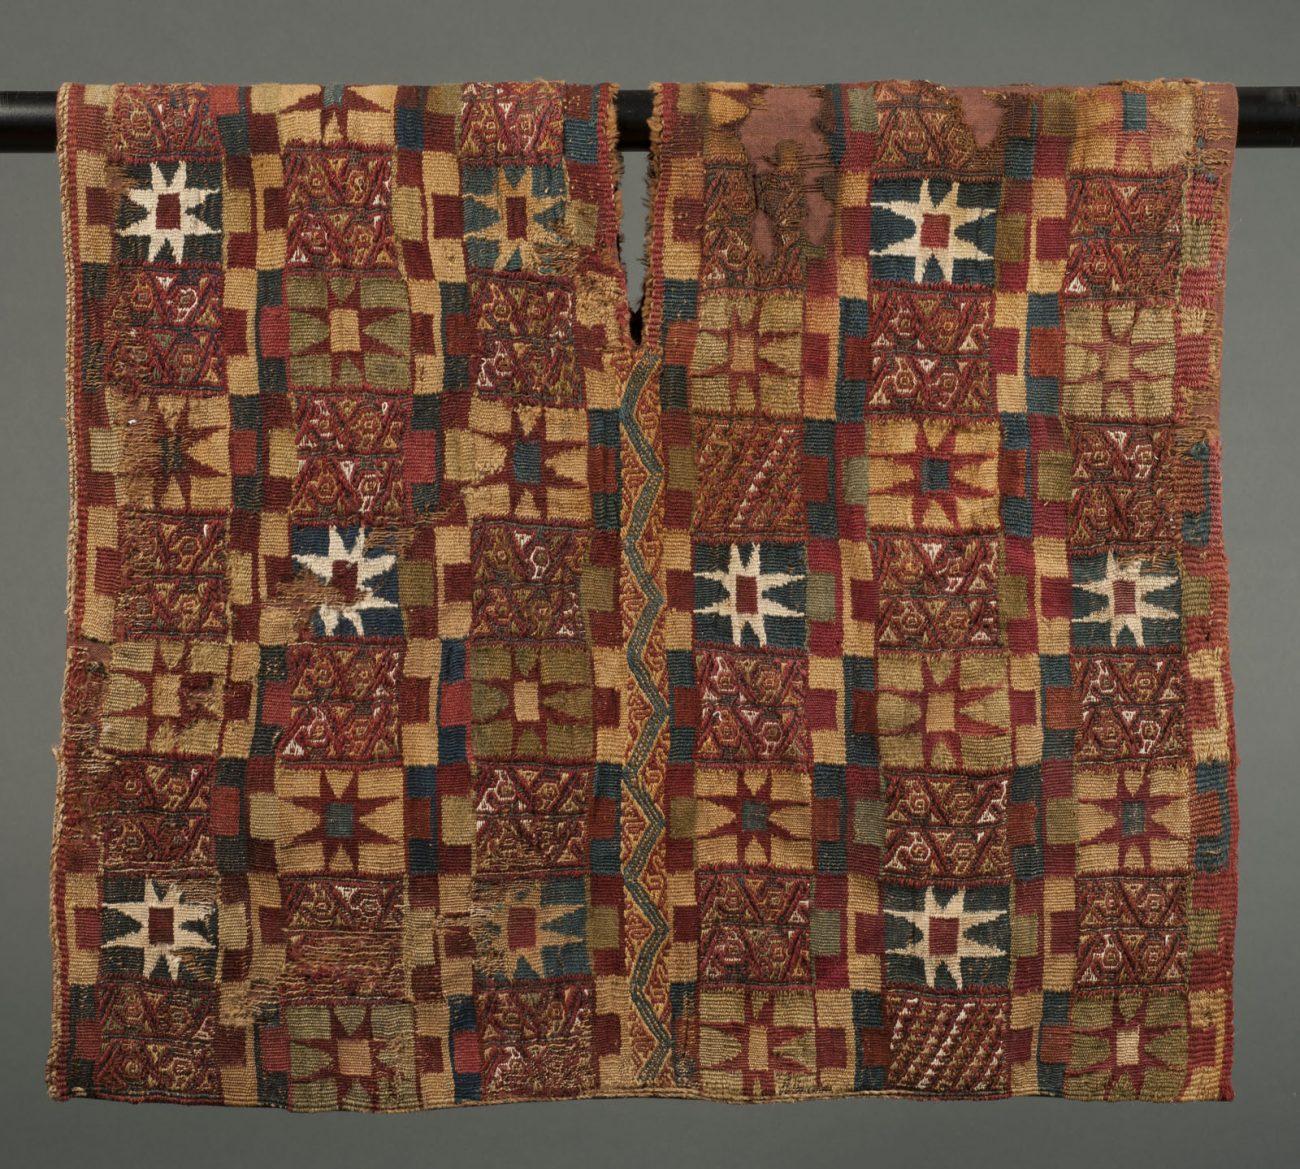 Unku, een tuniek in Chuquibamba-stijl van lamawol en katoen. Inca-beschaving, periode 1450 - 1532 CE, 55 x 96 cm.